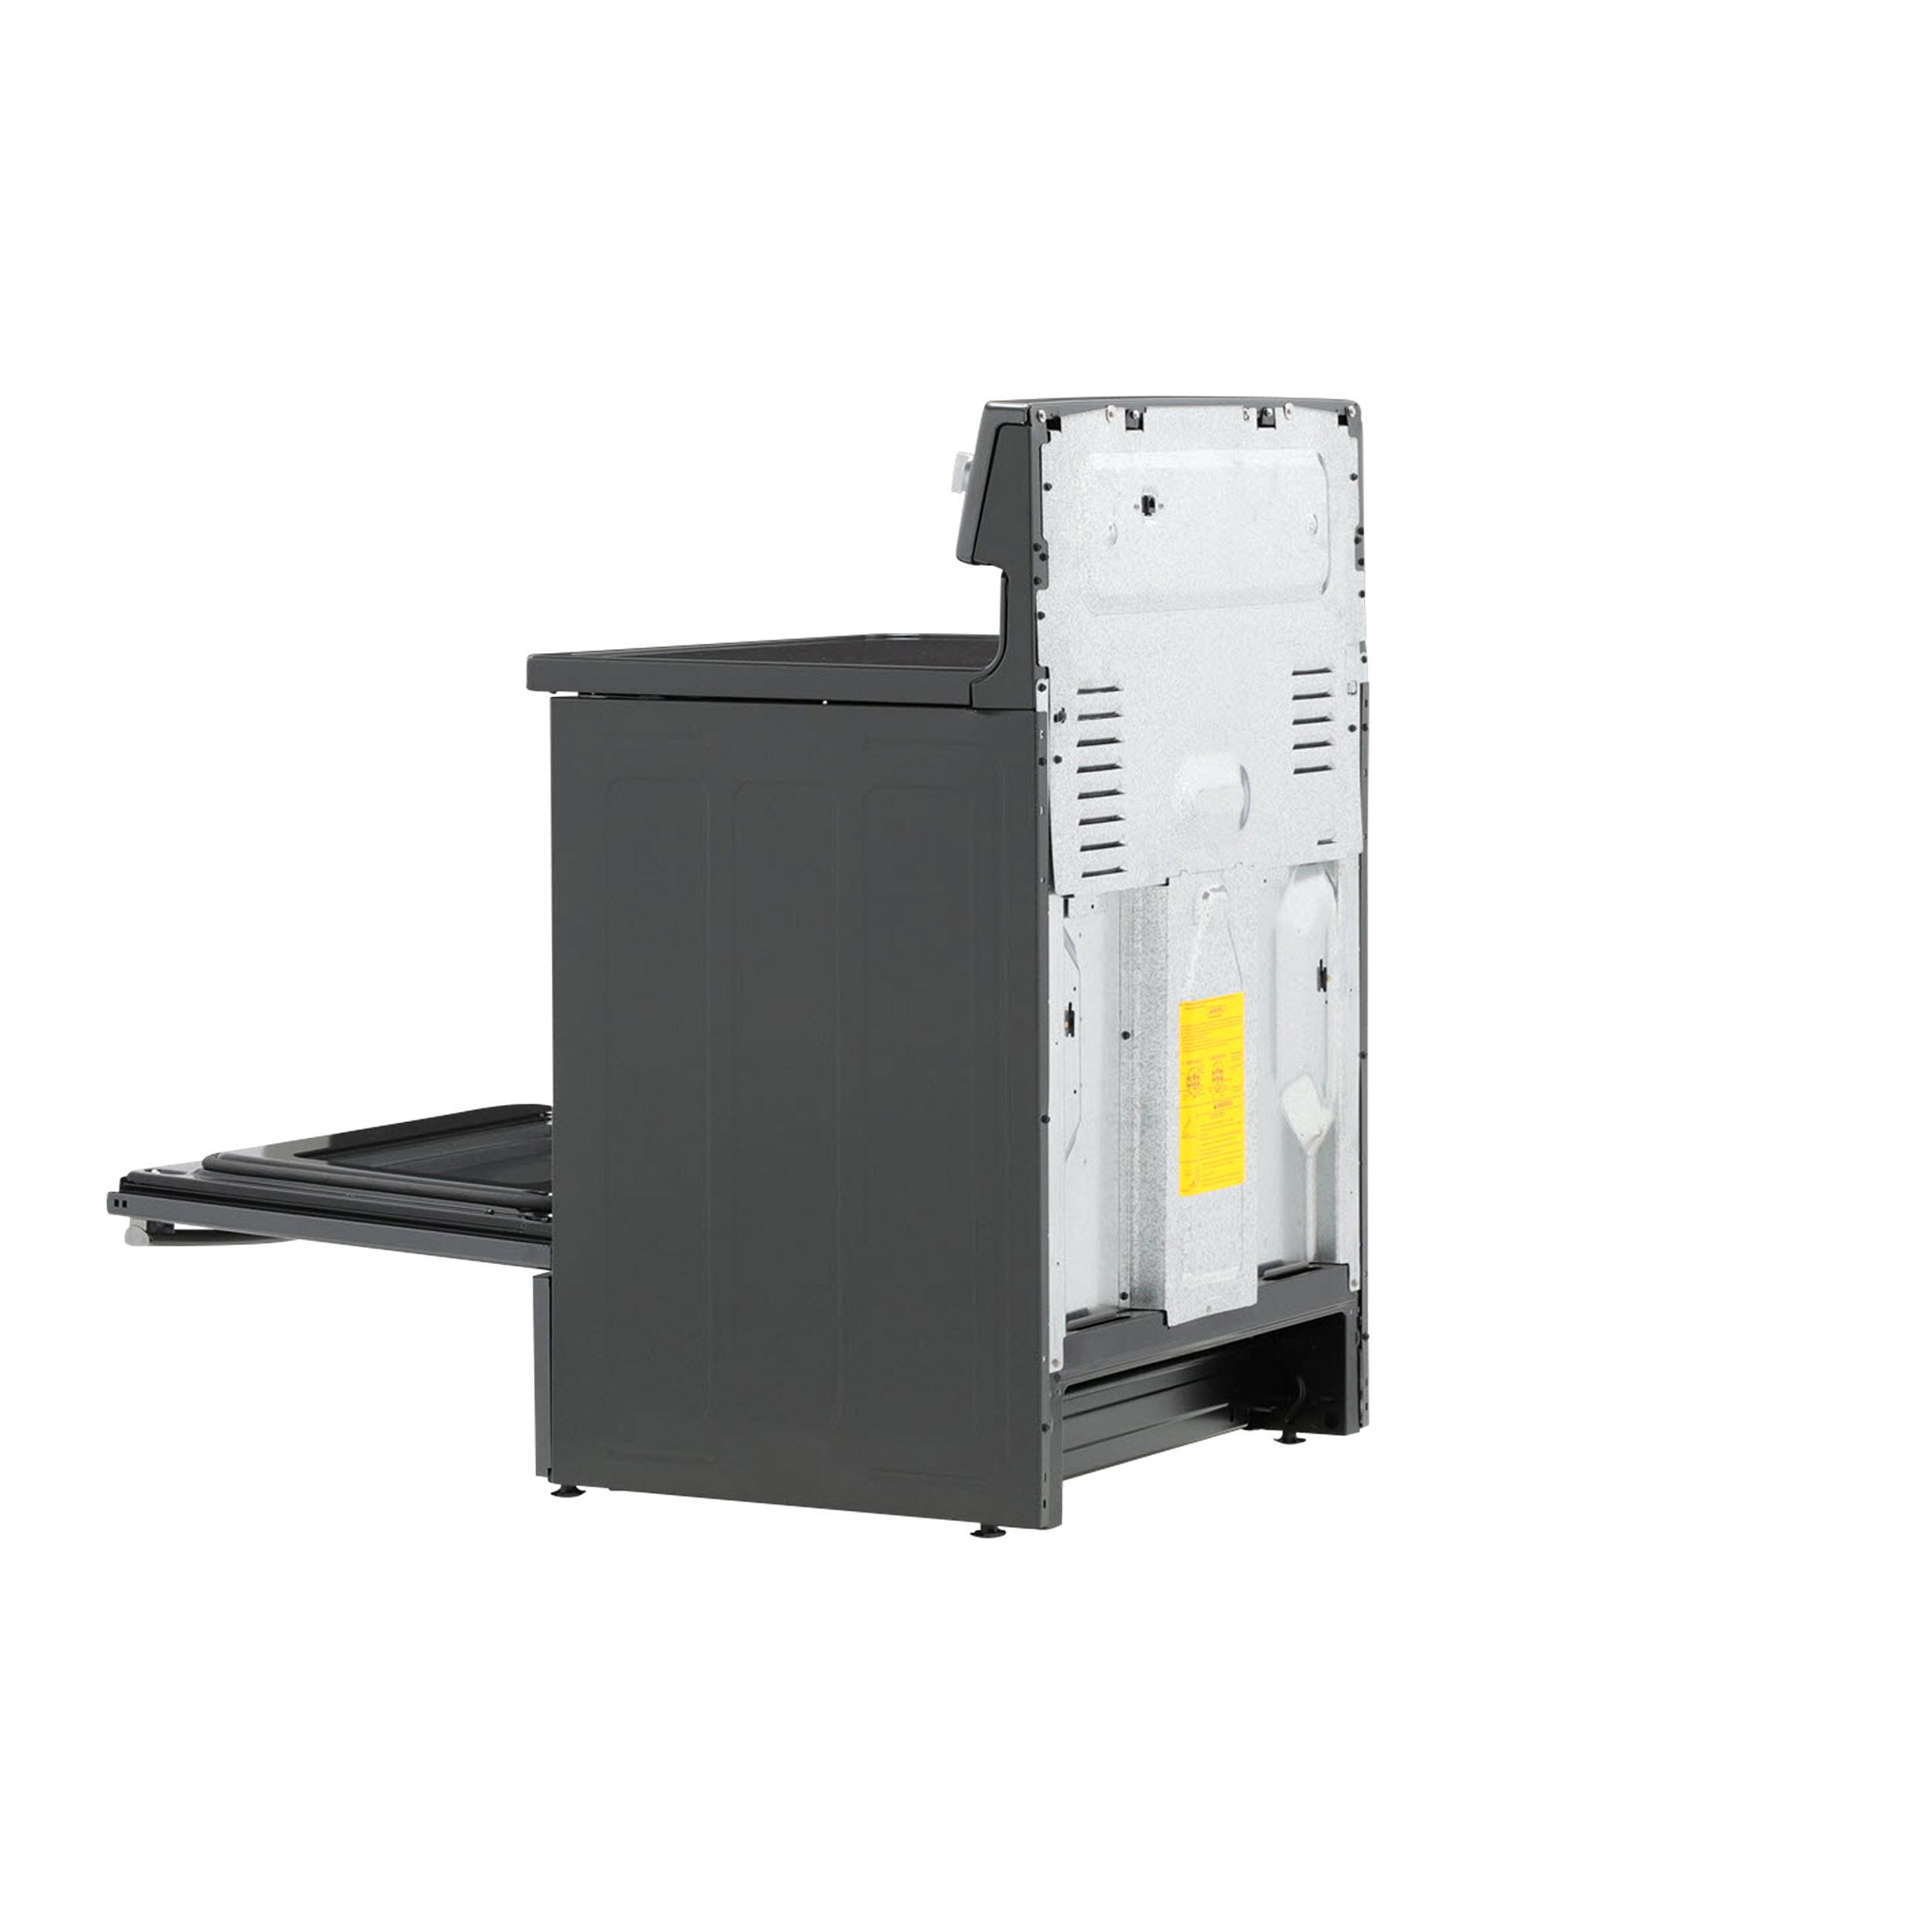 "Model: JB750FJDS | GE GE® 30"" Free-Standing Electric Convection Range"